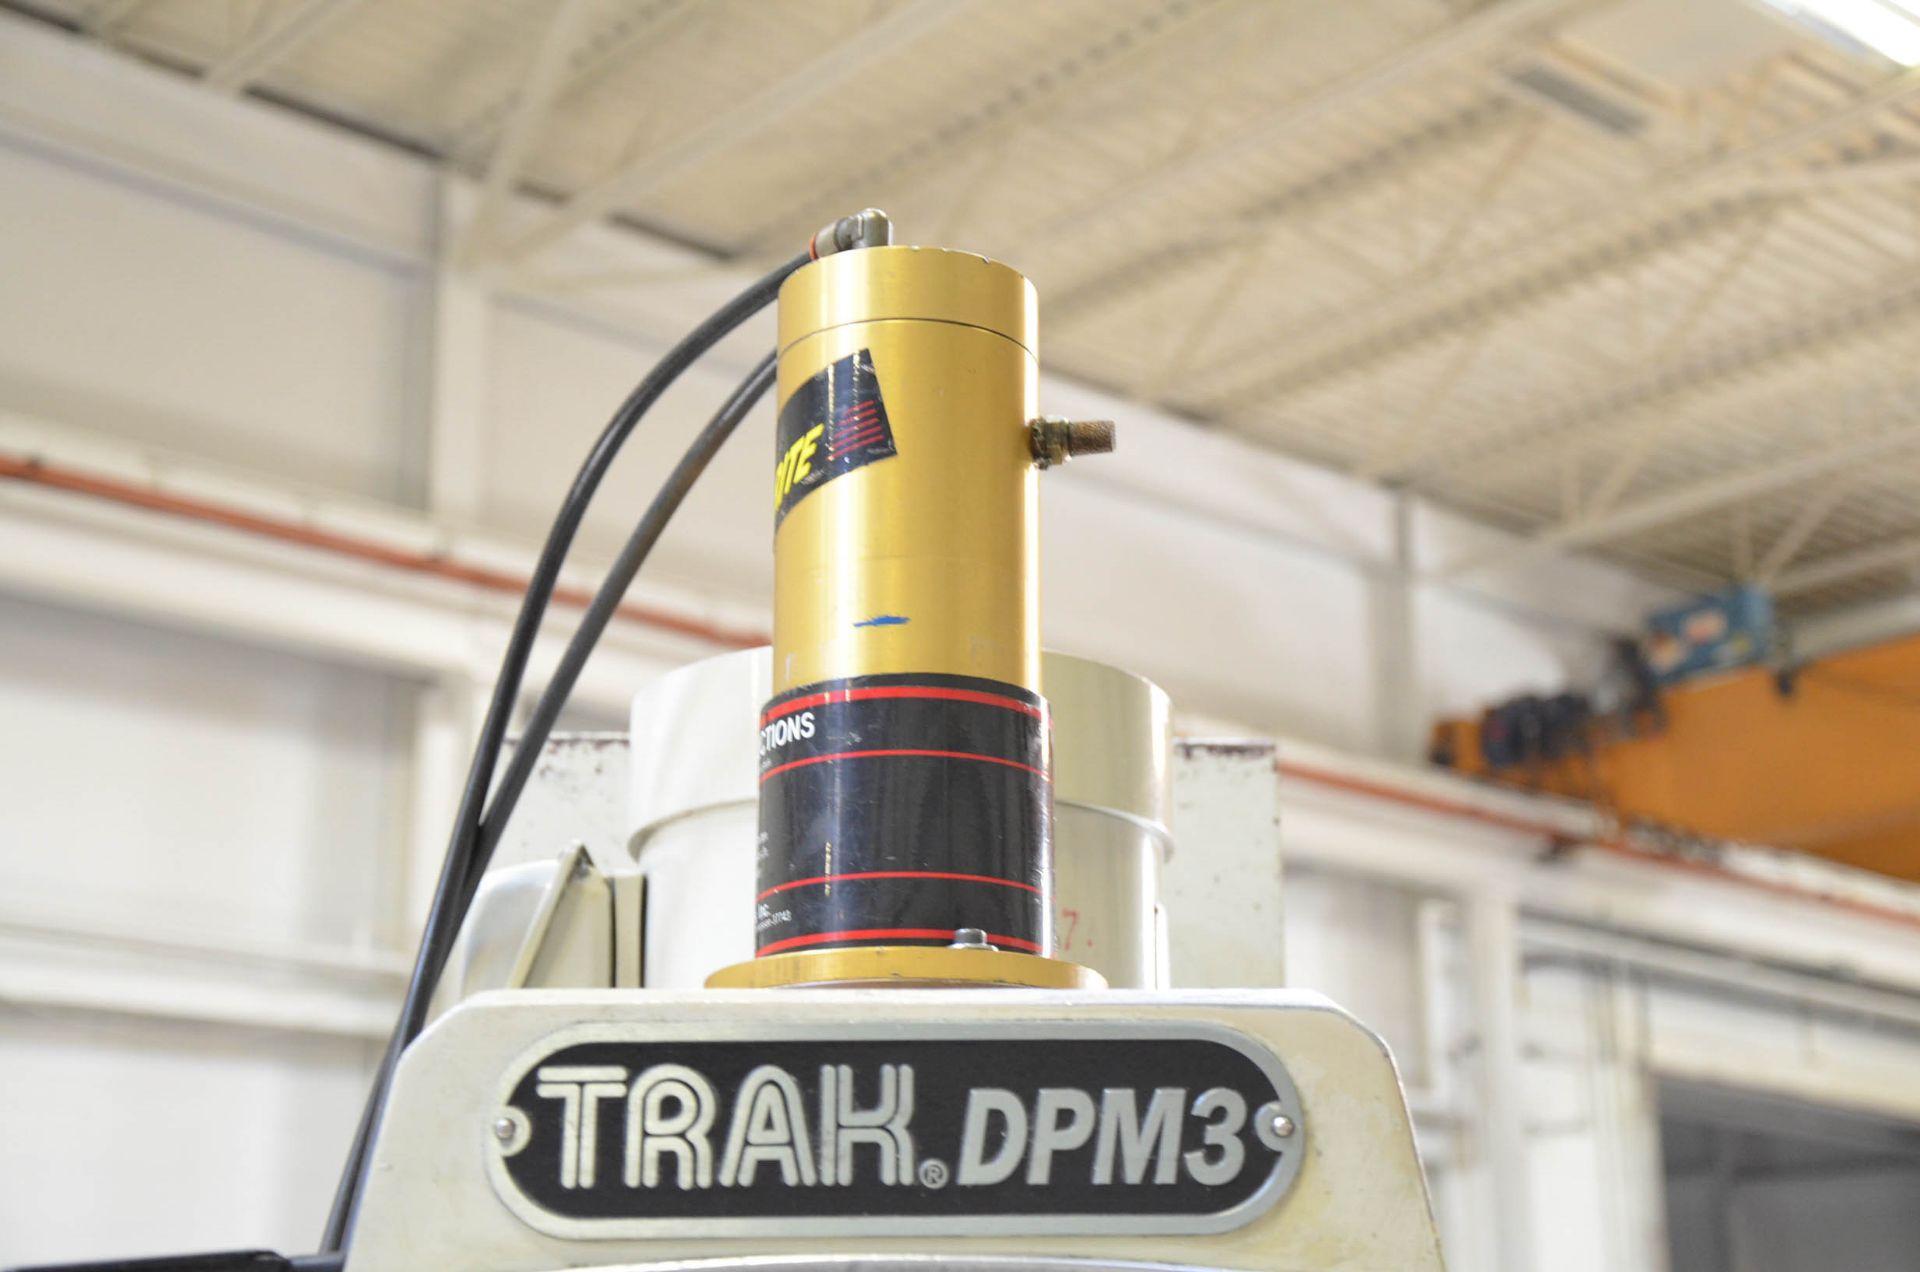 "TRAK DPM3 CNC VERTICAL TURRET MILLING MACHINE WITH PROTO TRAK (2007) SMX CNC CONTROL, 10"" X 50"" - Image 4 of 7"